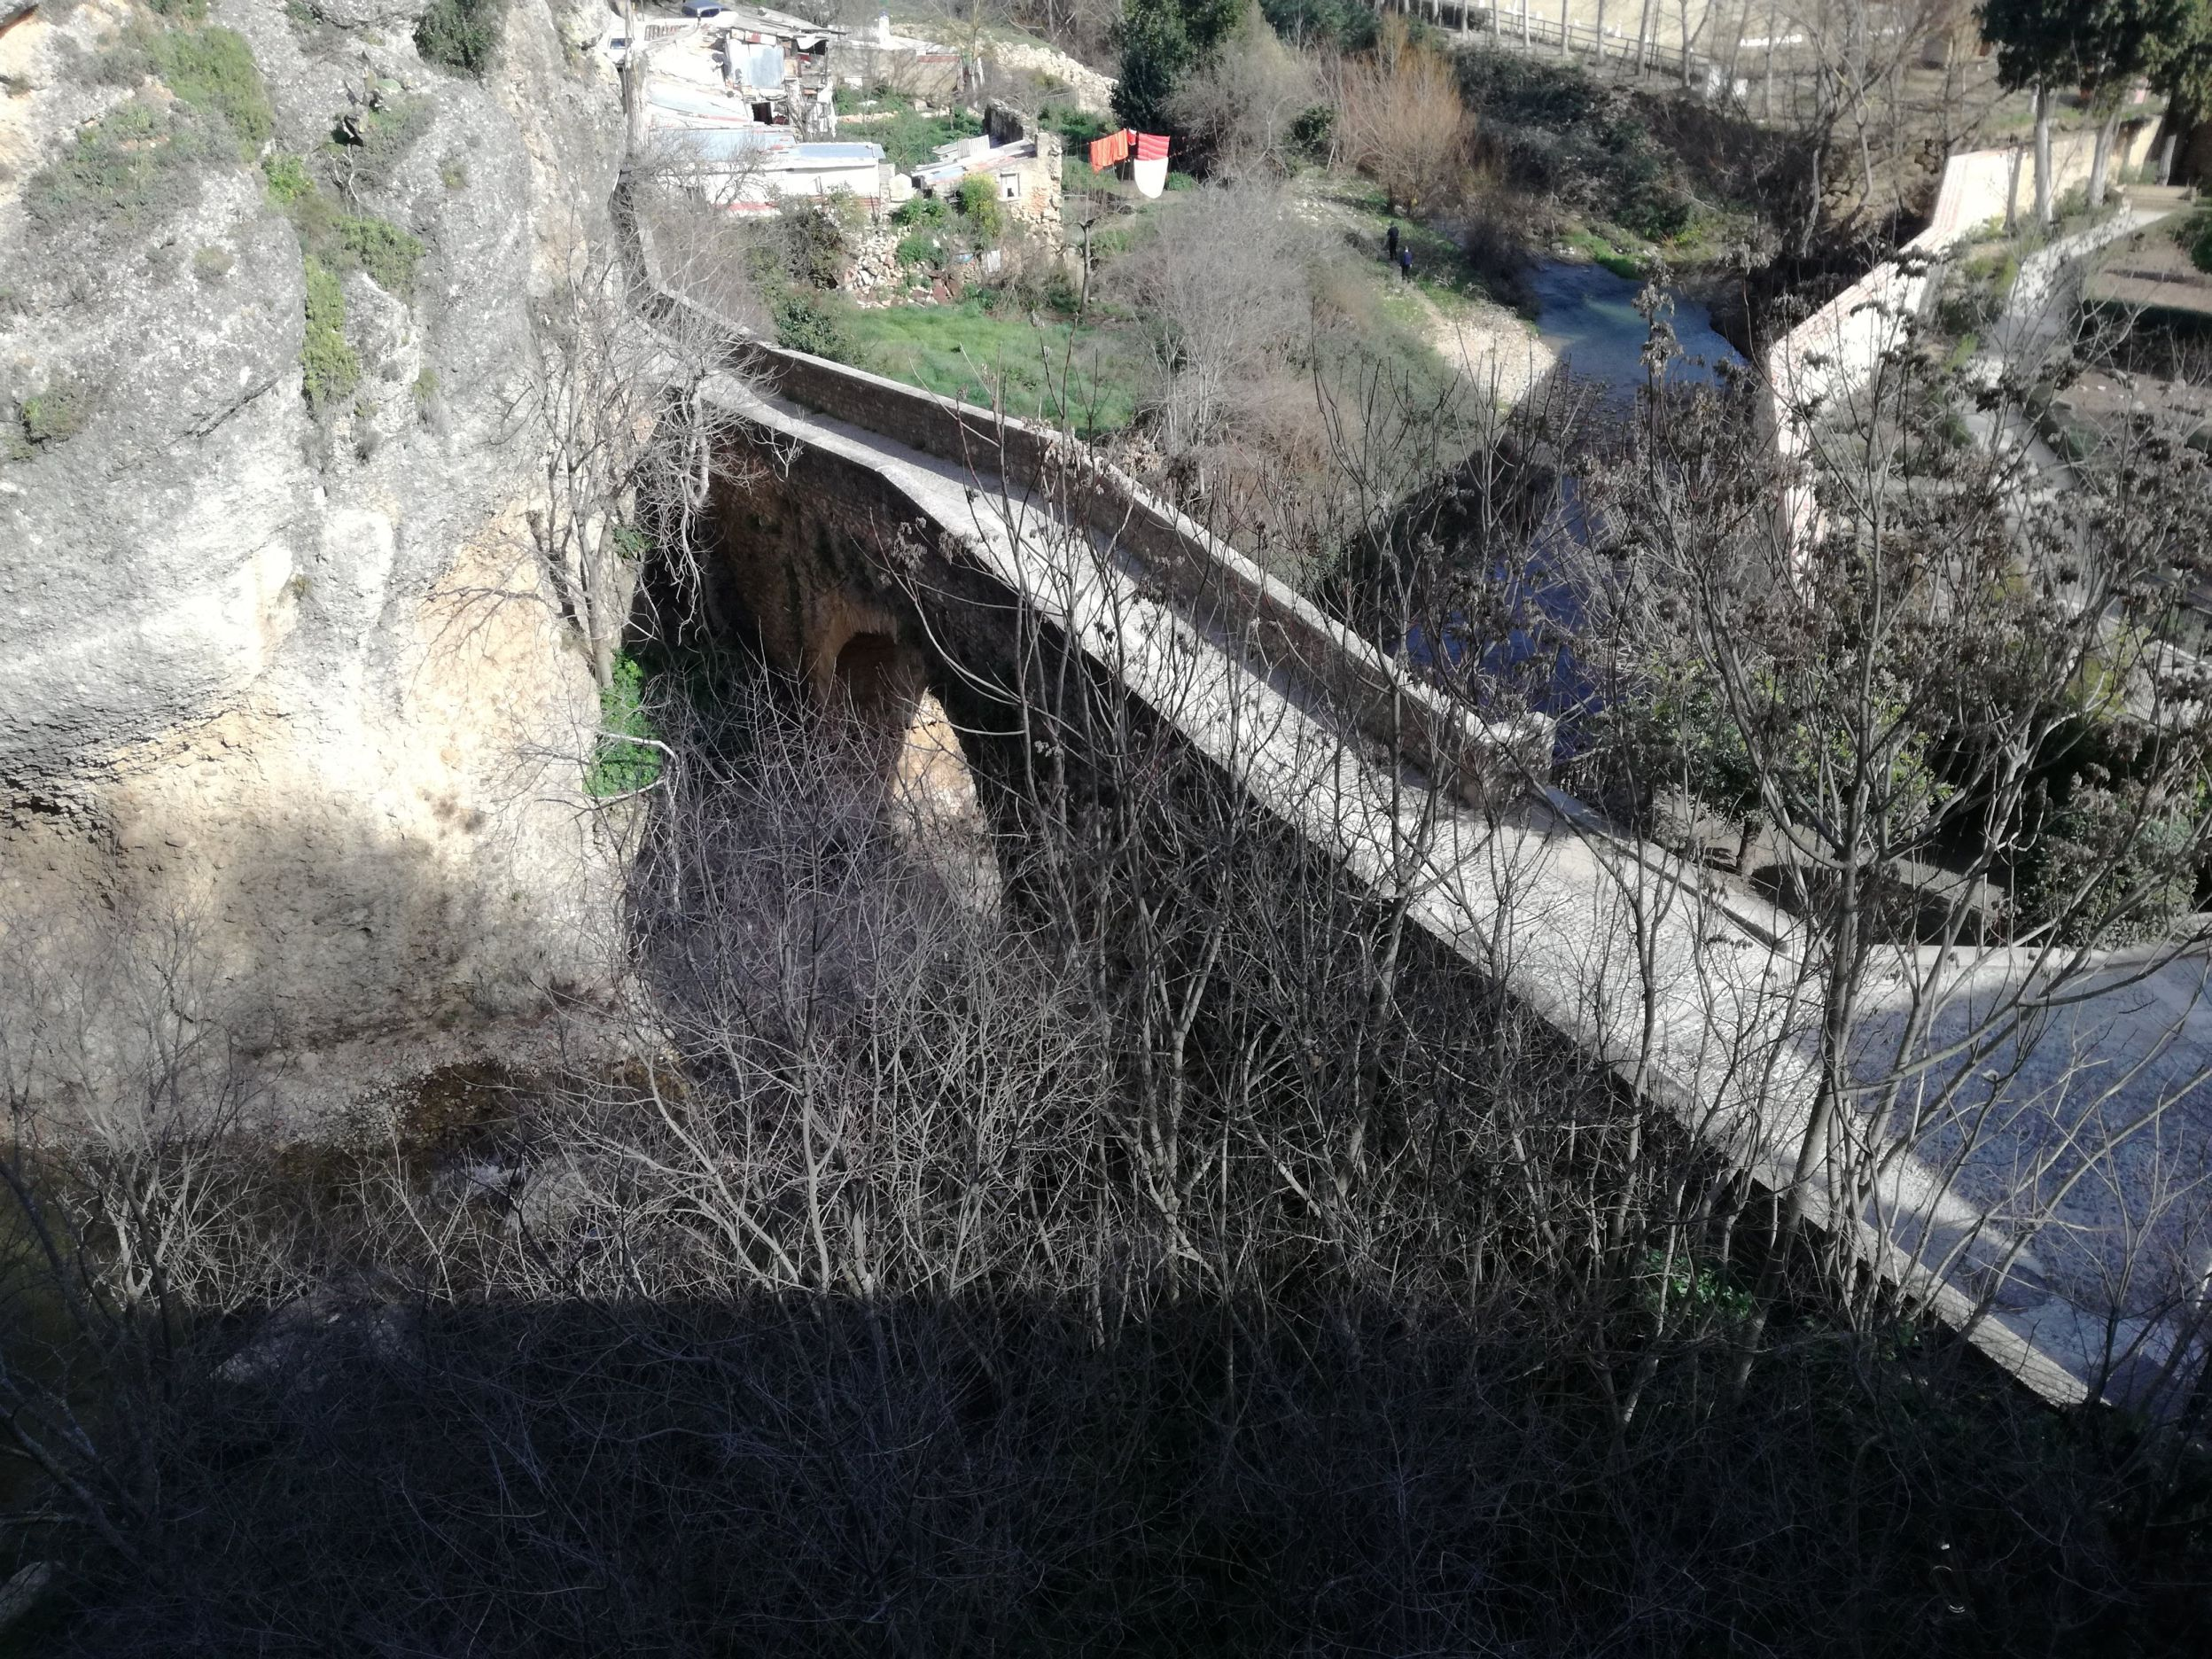 Arab híd